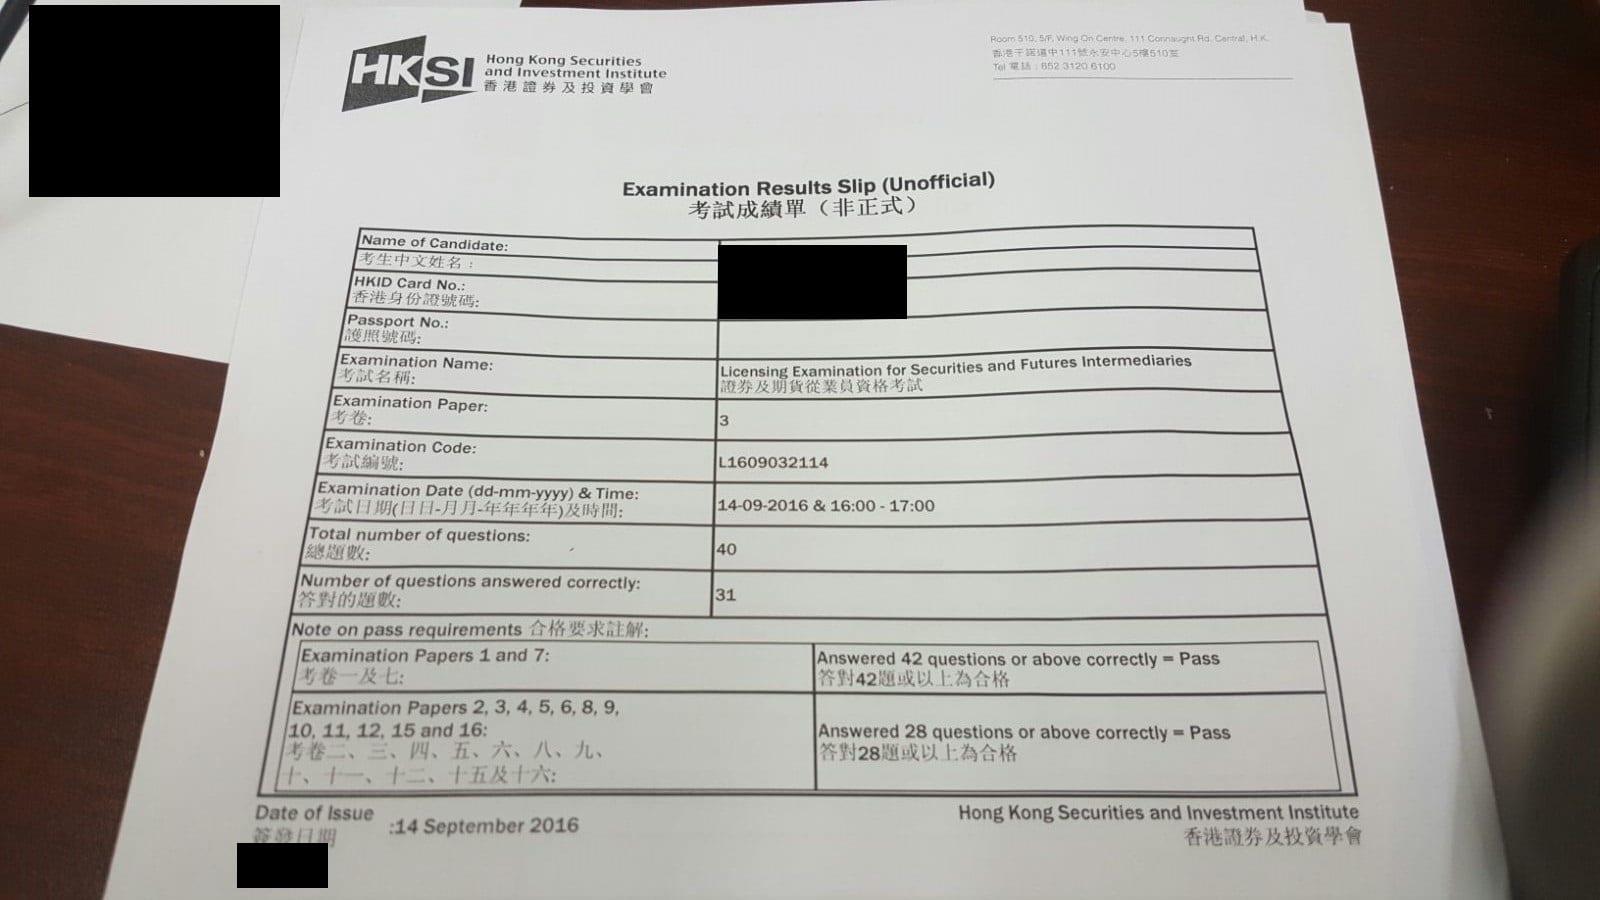 HPH 14/9/2016 LE Paper 3 證券期貨從業員資格考試卷三 Pass